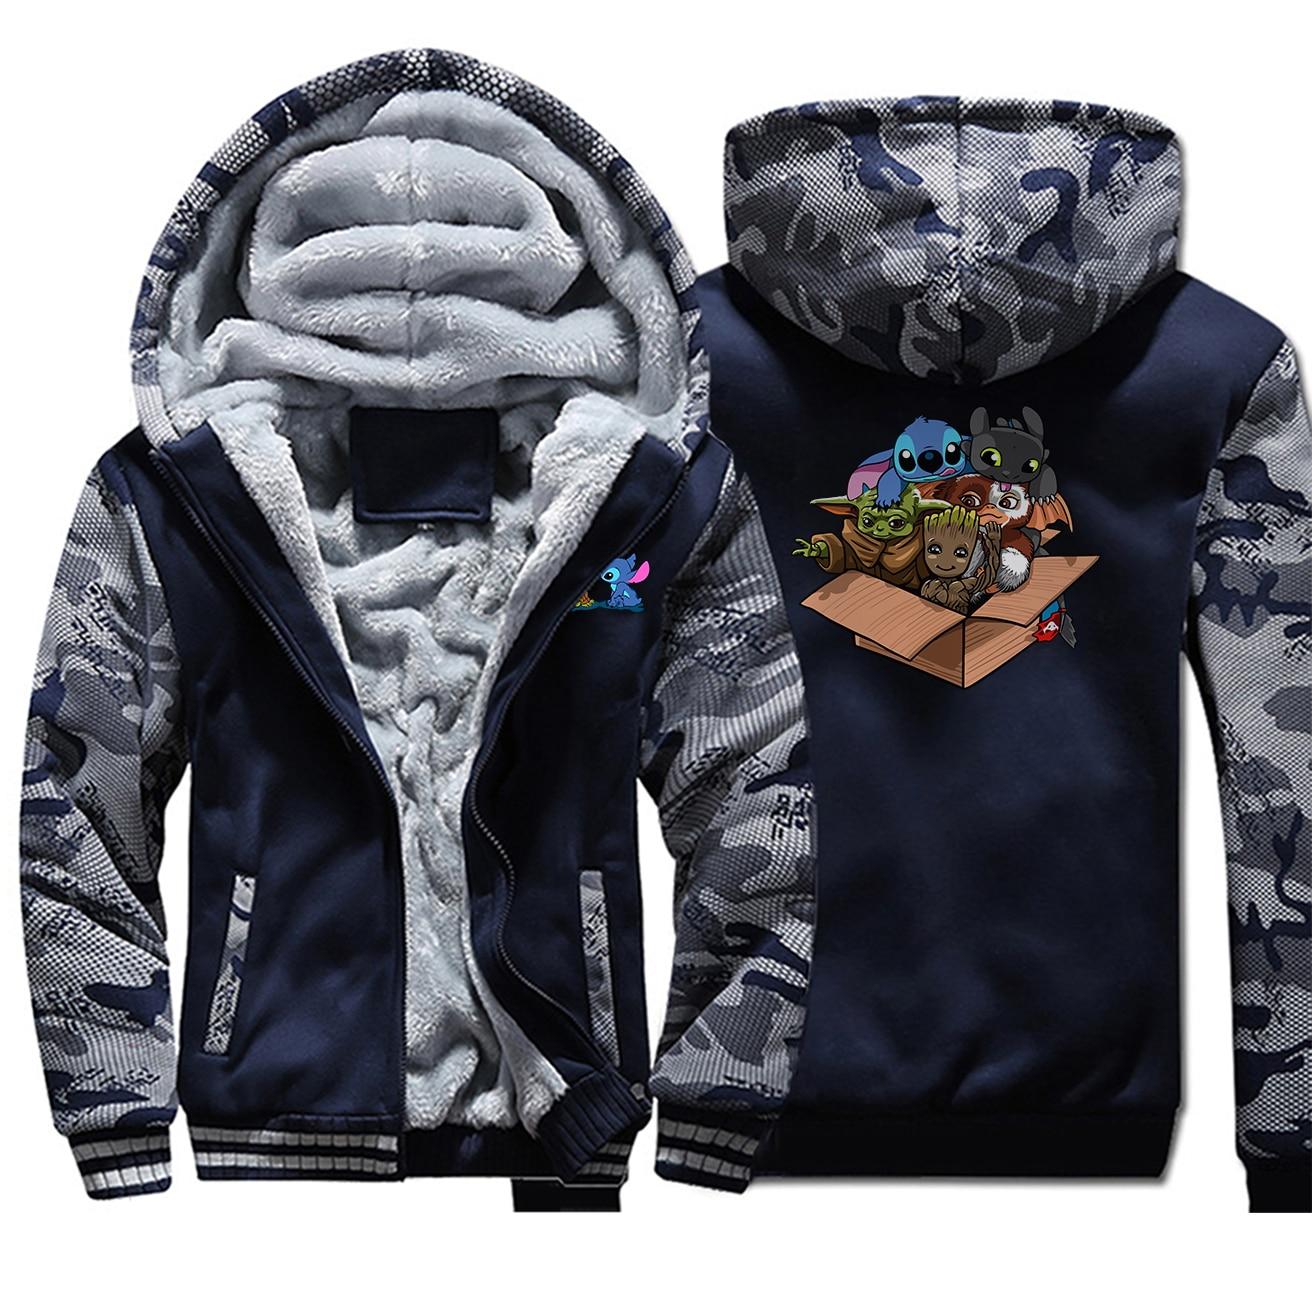 Baby Yoda Stitch Groot Camo Thick Warm Jacket Mens Kawaii Full Hoodies Zipper Hoodie Sweatshirt The Mandalorian Casaco Masculino